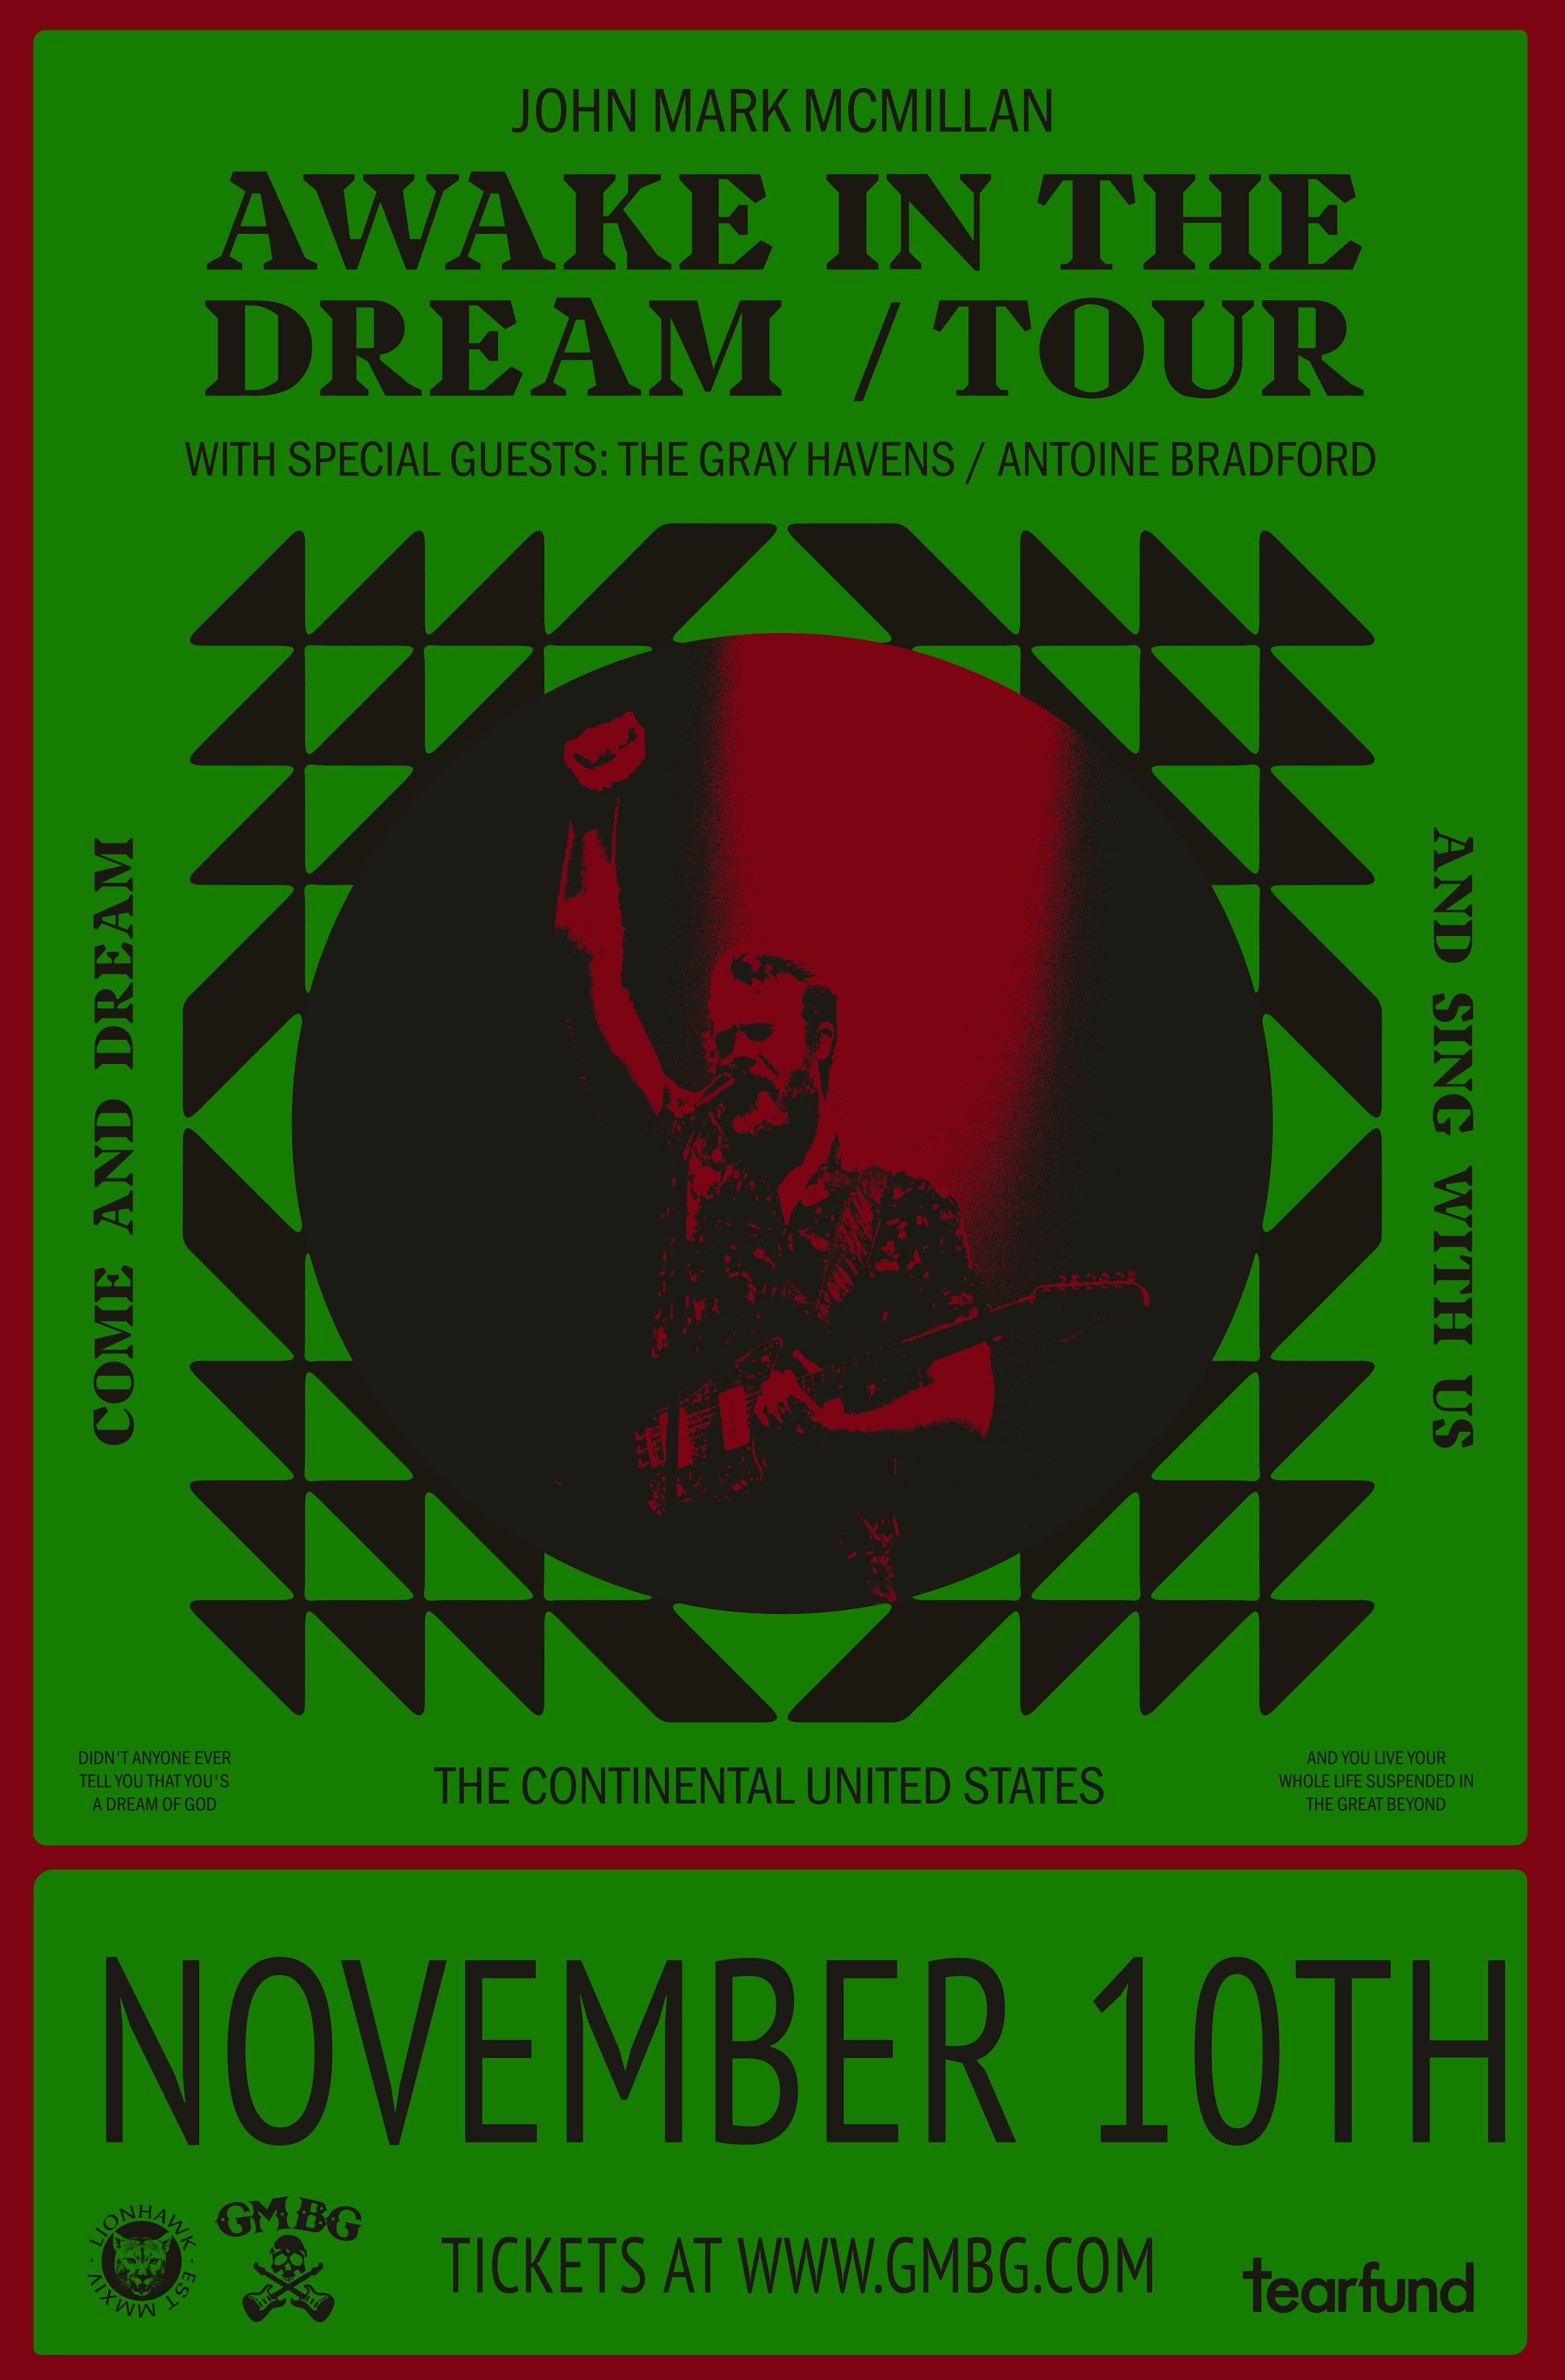 John Mark McMillan: Awake In The Dream Tour